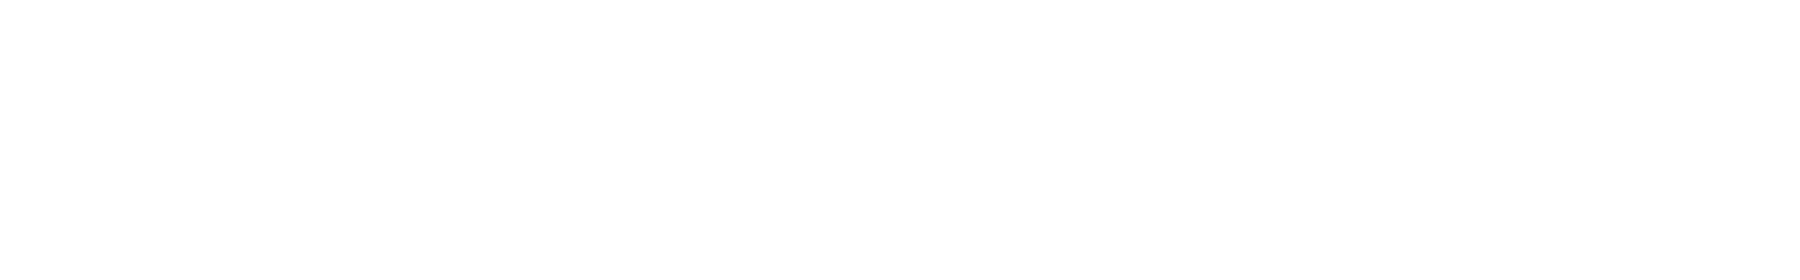 dts chordlp 27a cm